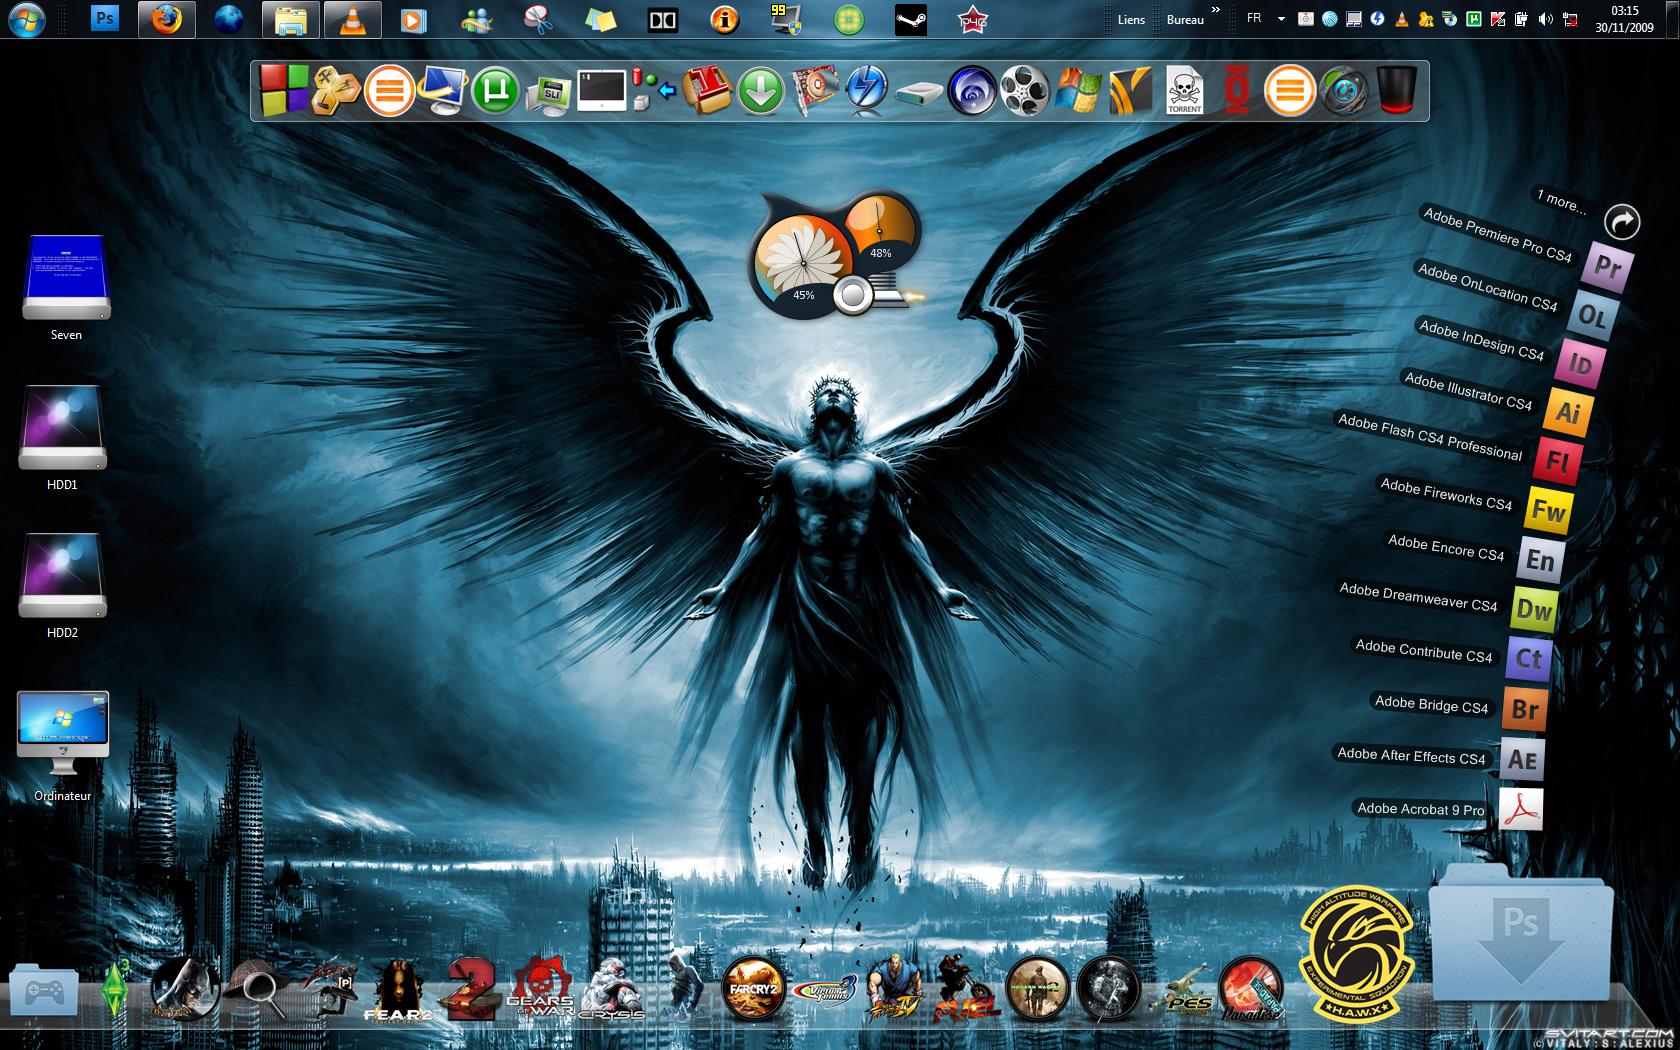 Dow Wallpaper Desktop httpre downloadsinfoWallpapers Windows 7 1680x1050